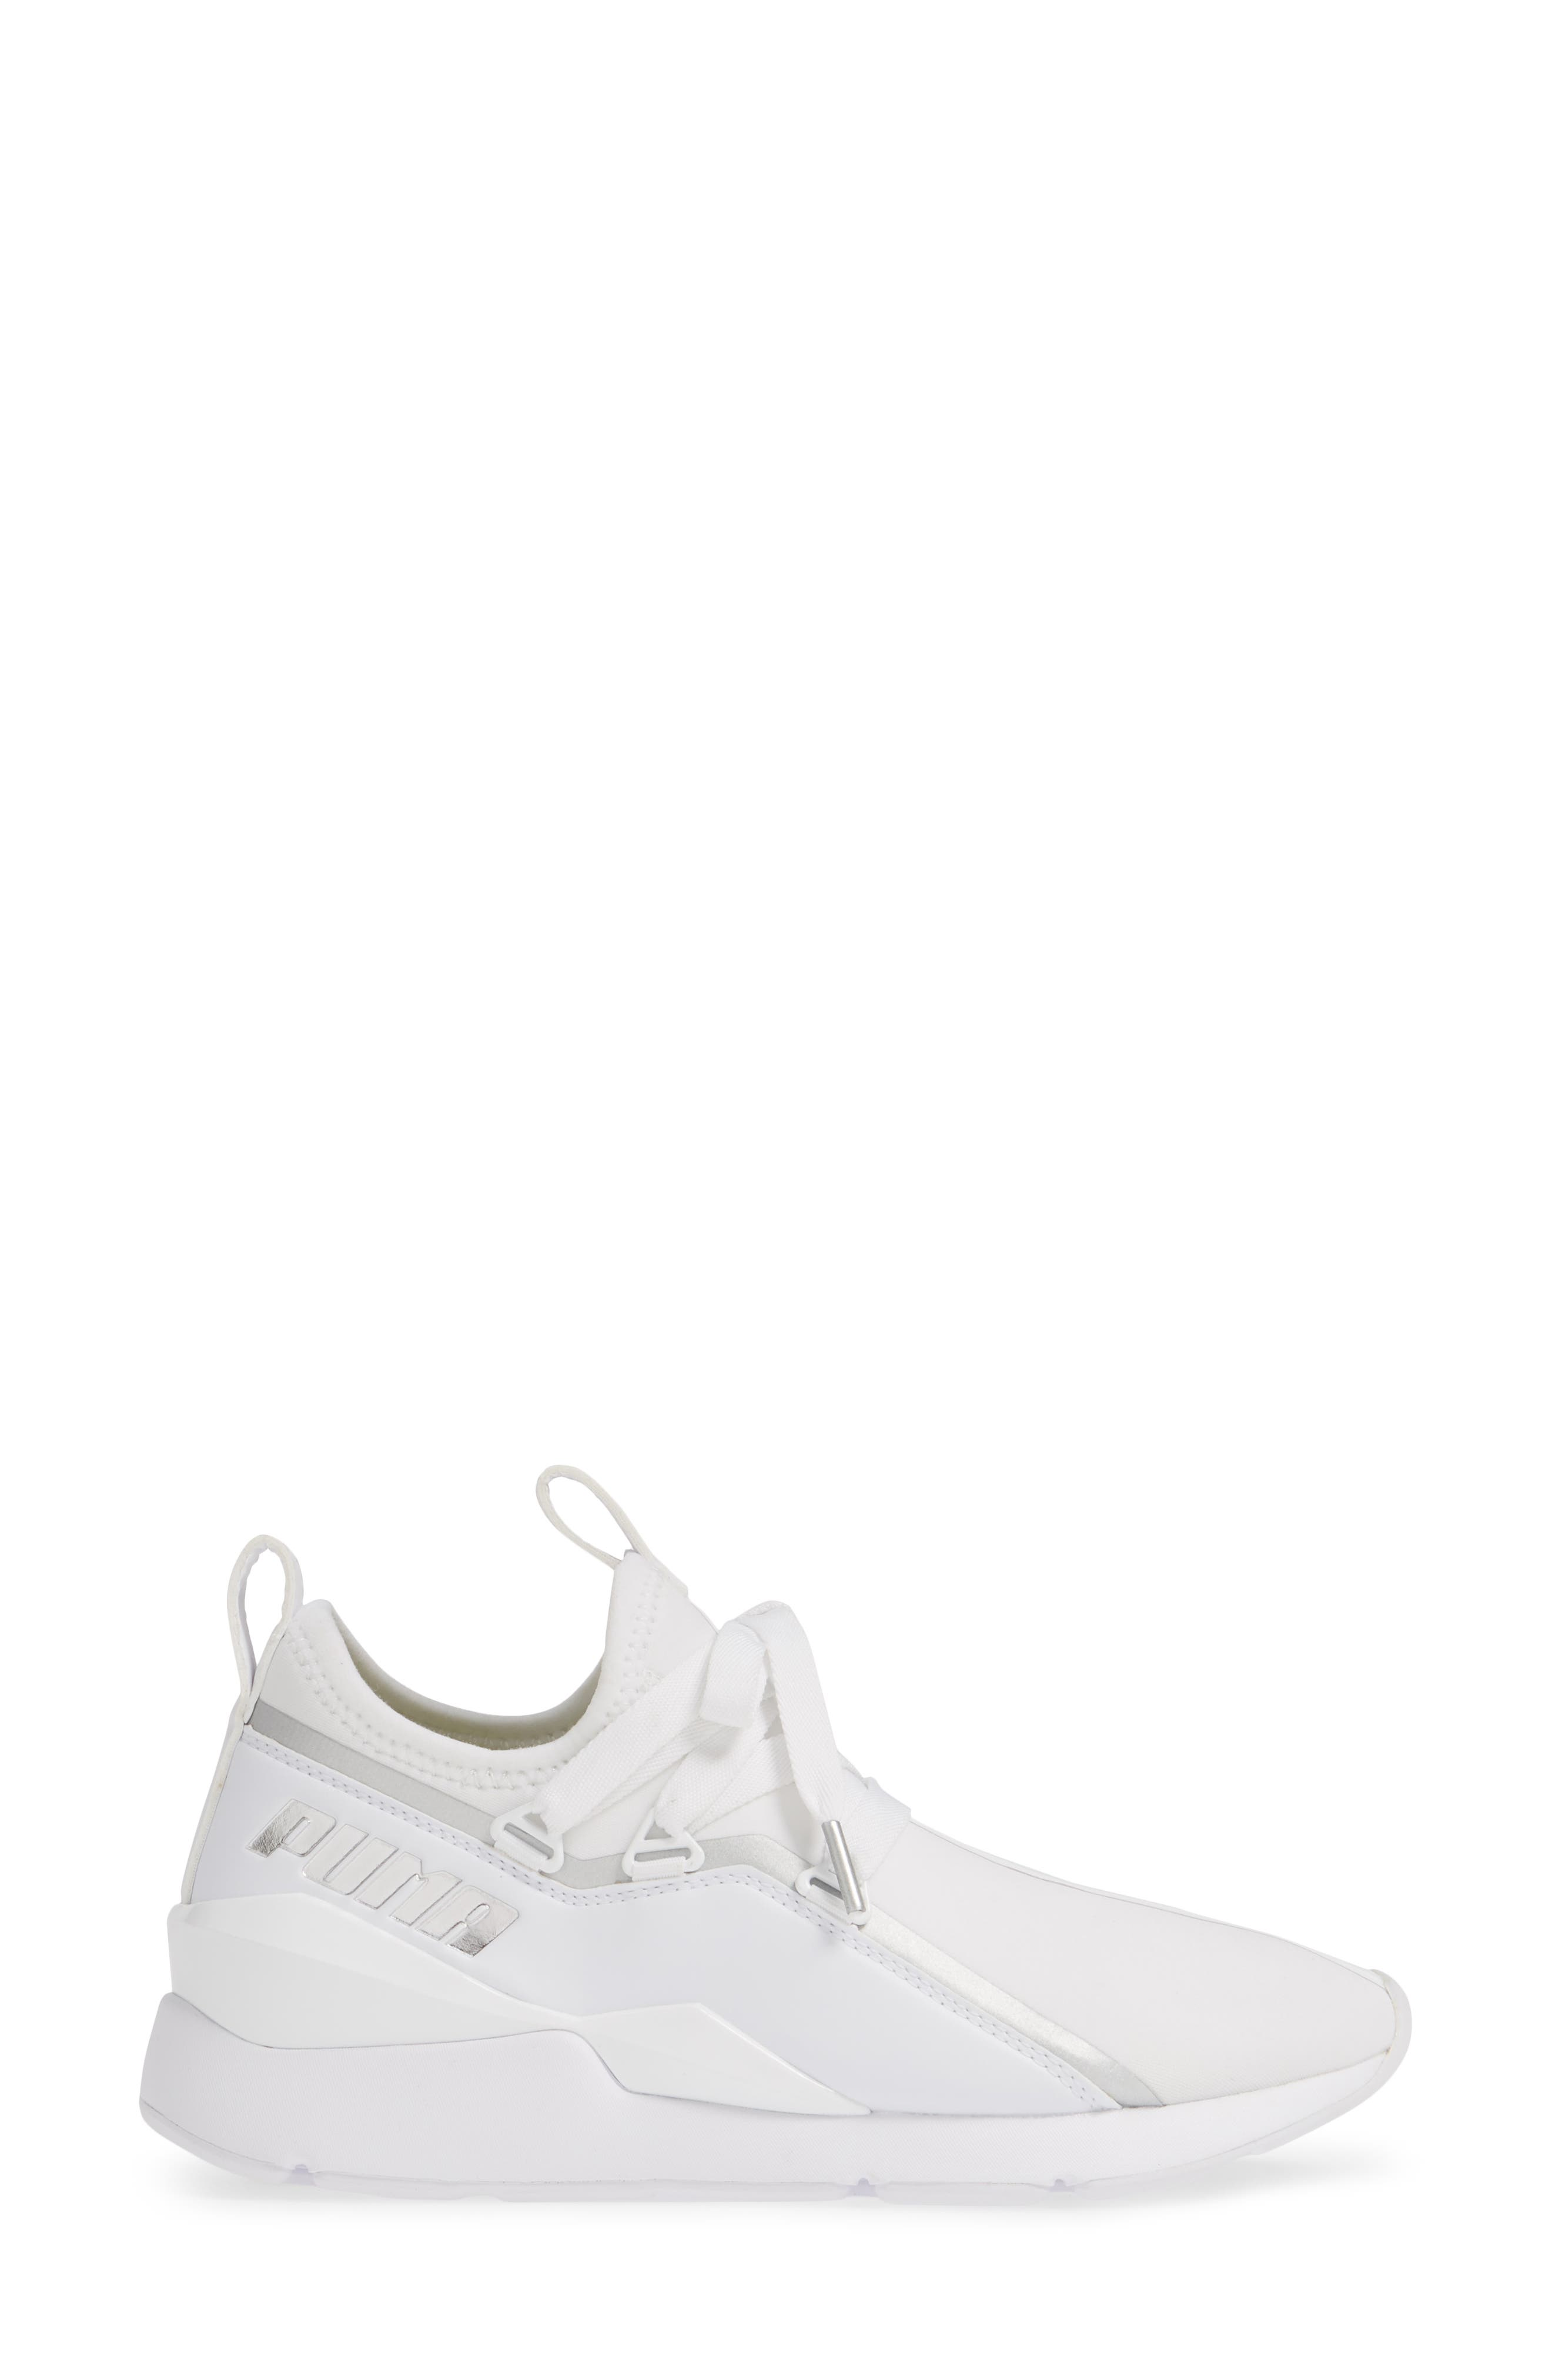 PUMA, Muse 2 Trailblazer Sneaker, Alternate thumbnail 3, color, WHITE/ SILVER